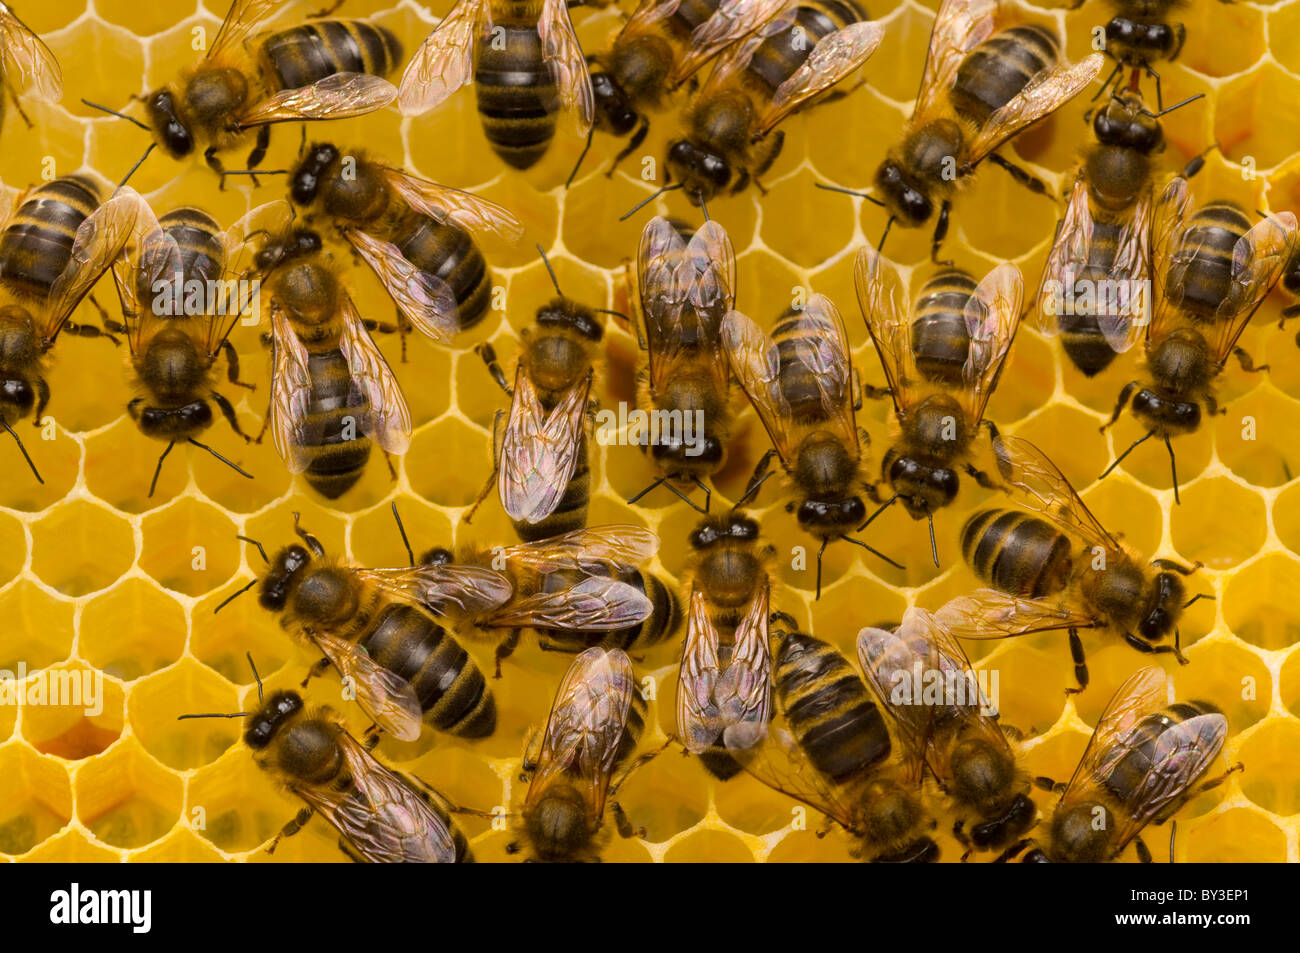 Las abejas melíferas Apis mellifera sobre Honeycomb Foto de stock